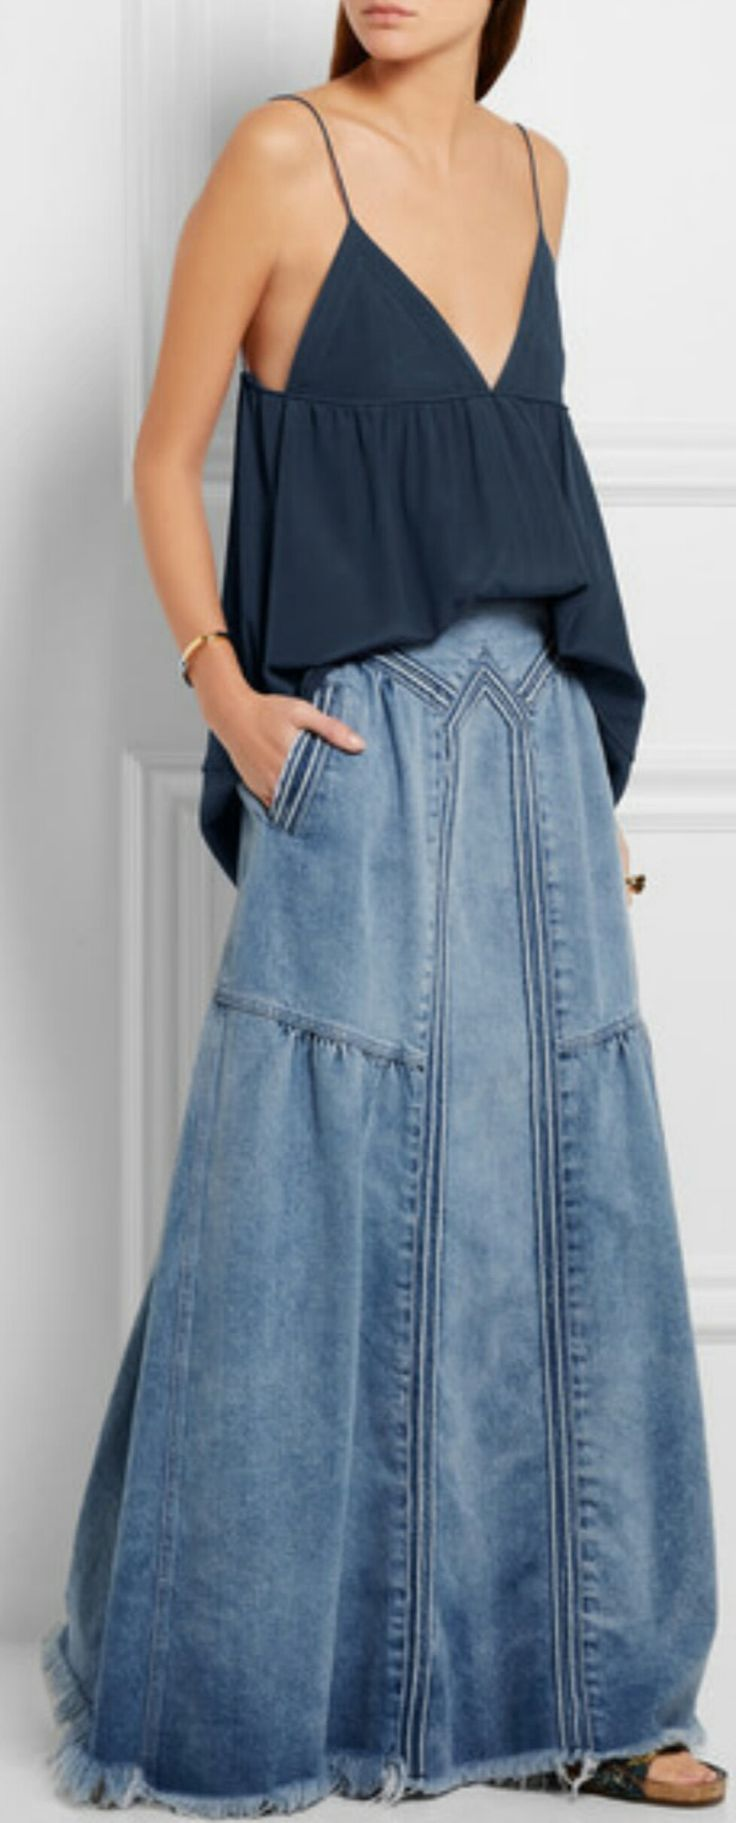 DENIM - Frayed denim maxi skirt ( CHLOÉ ), Silk crepe de chine camisole ( CHLOÈ ),  Fringed bouclé-jacquard slides ( CHLOÉ )